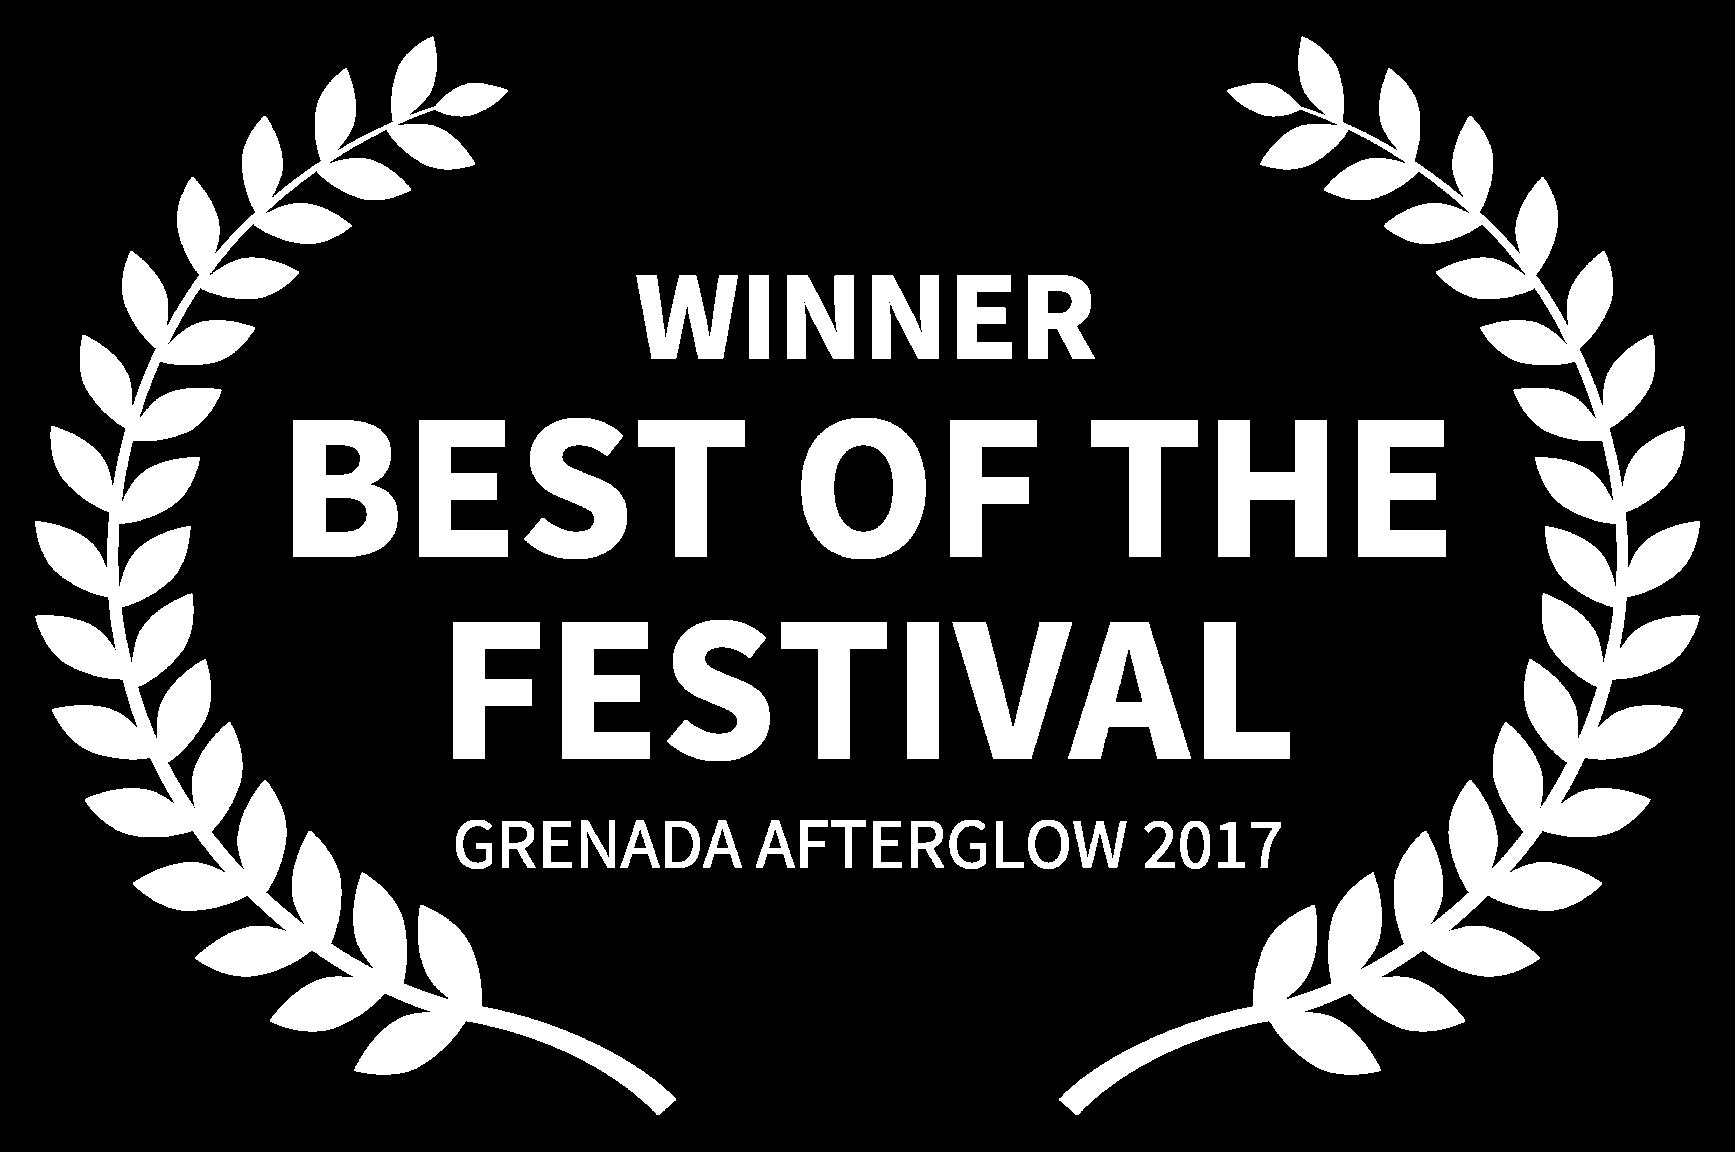 WINNER - BEST OF THE FESTIVAL - GRENADA AFTERGLOW 2017 (1).png